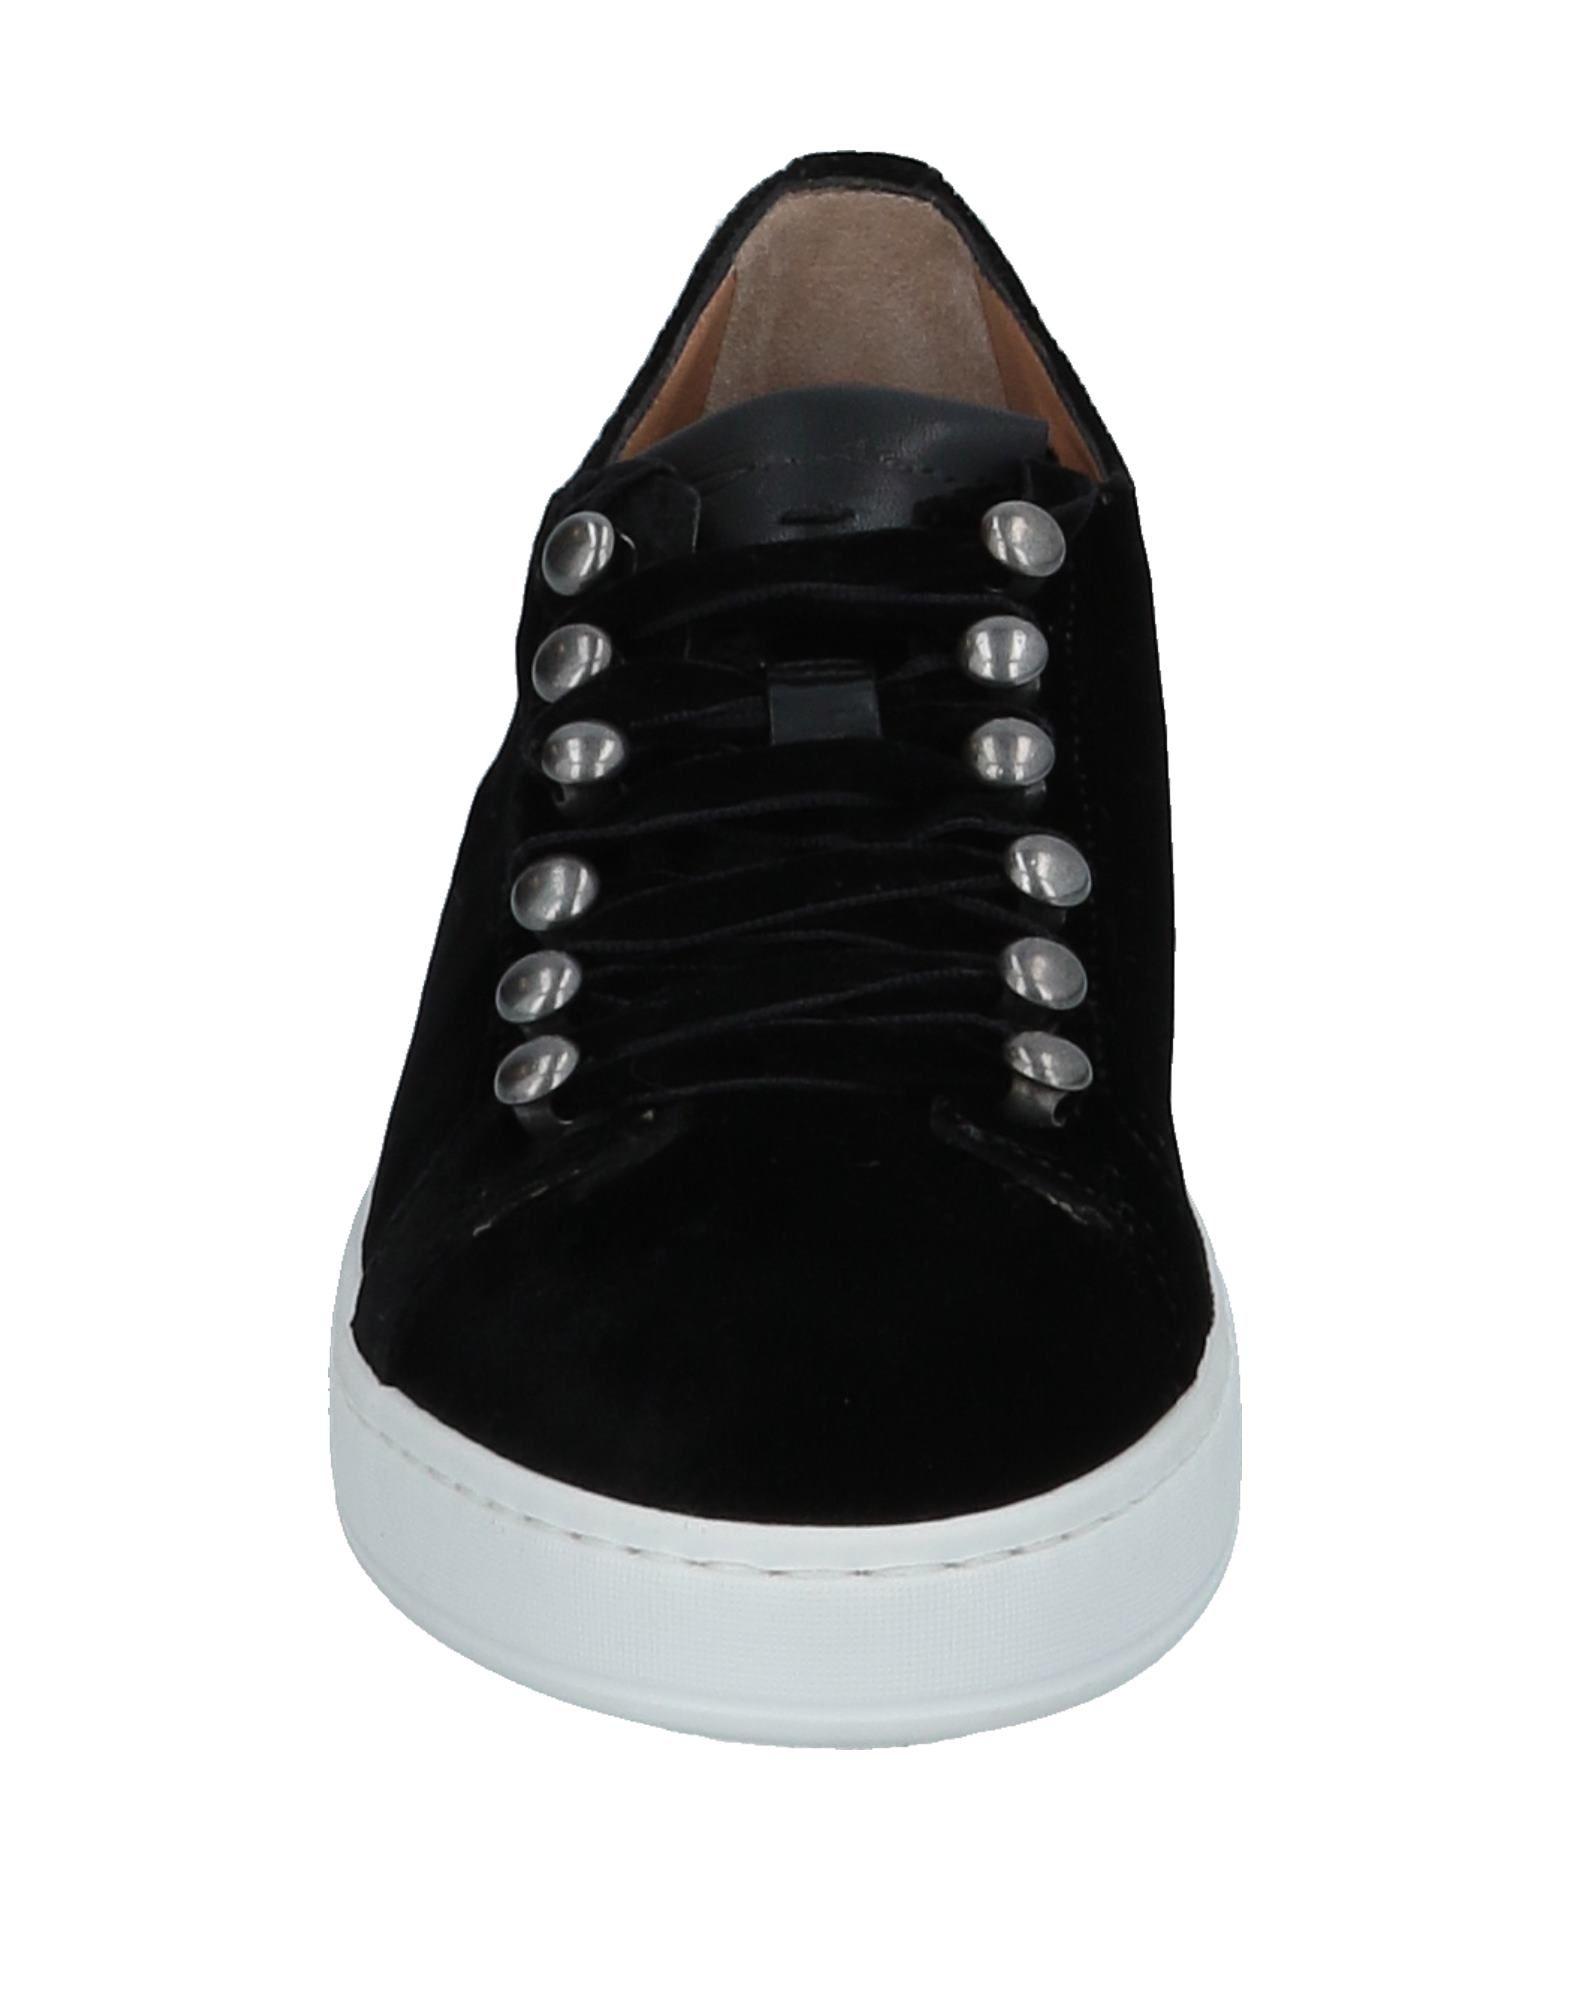 Rabatt  Schuhe Santoni Sneakers Damen  Rabatt 11539675OS 713d81